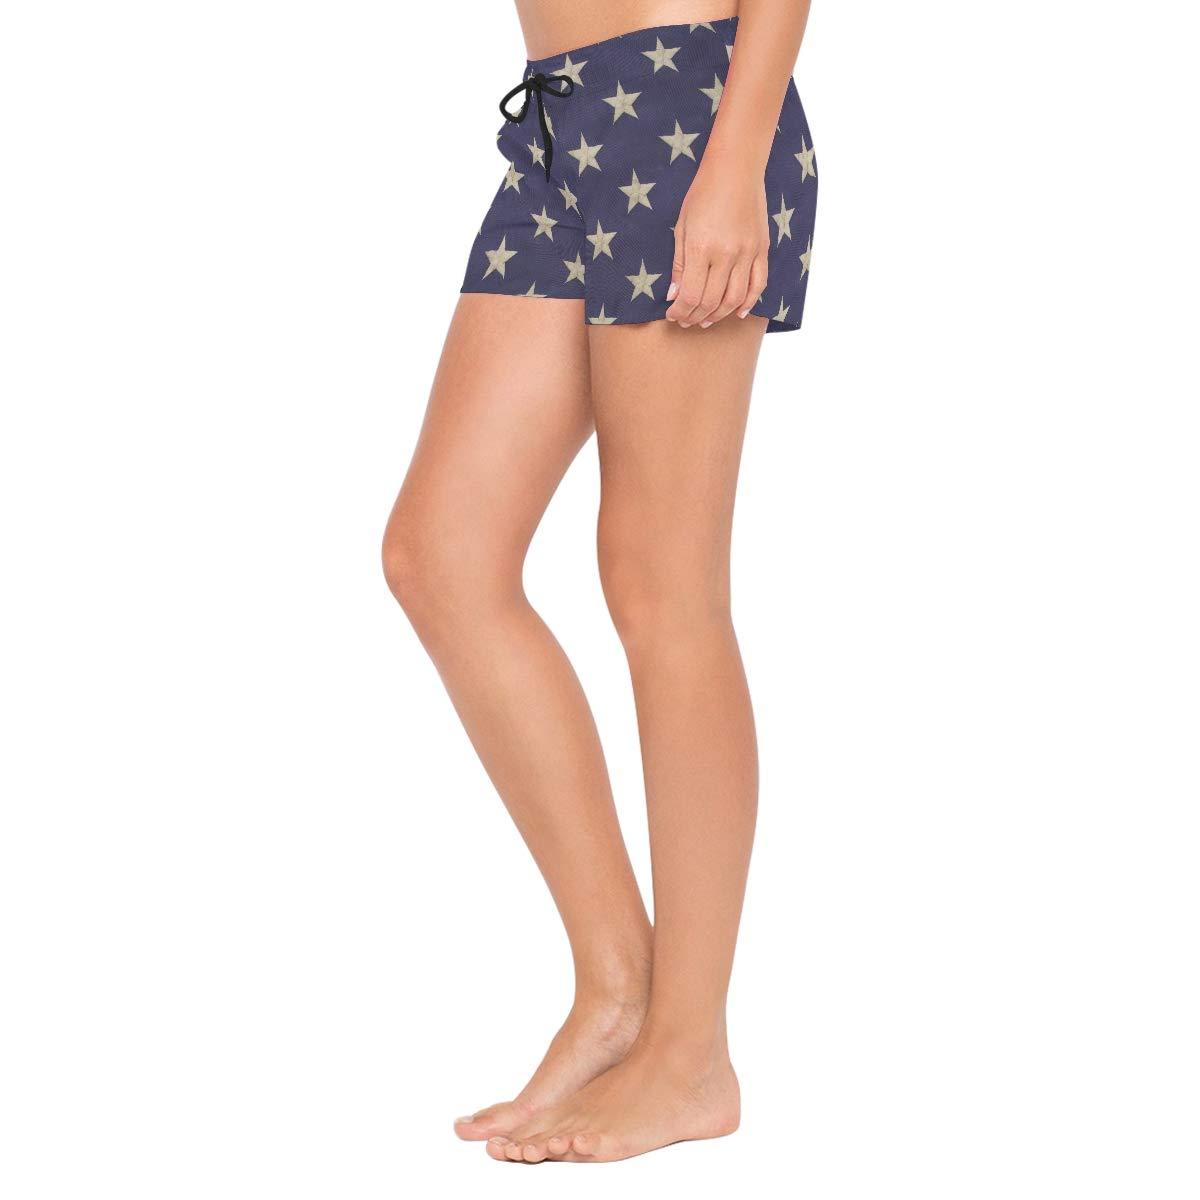 L Star Purple Background Womens Board Shorts with Pockets Quick Dry Drawstring Beach Swim Trunks S